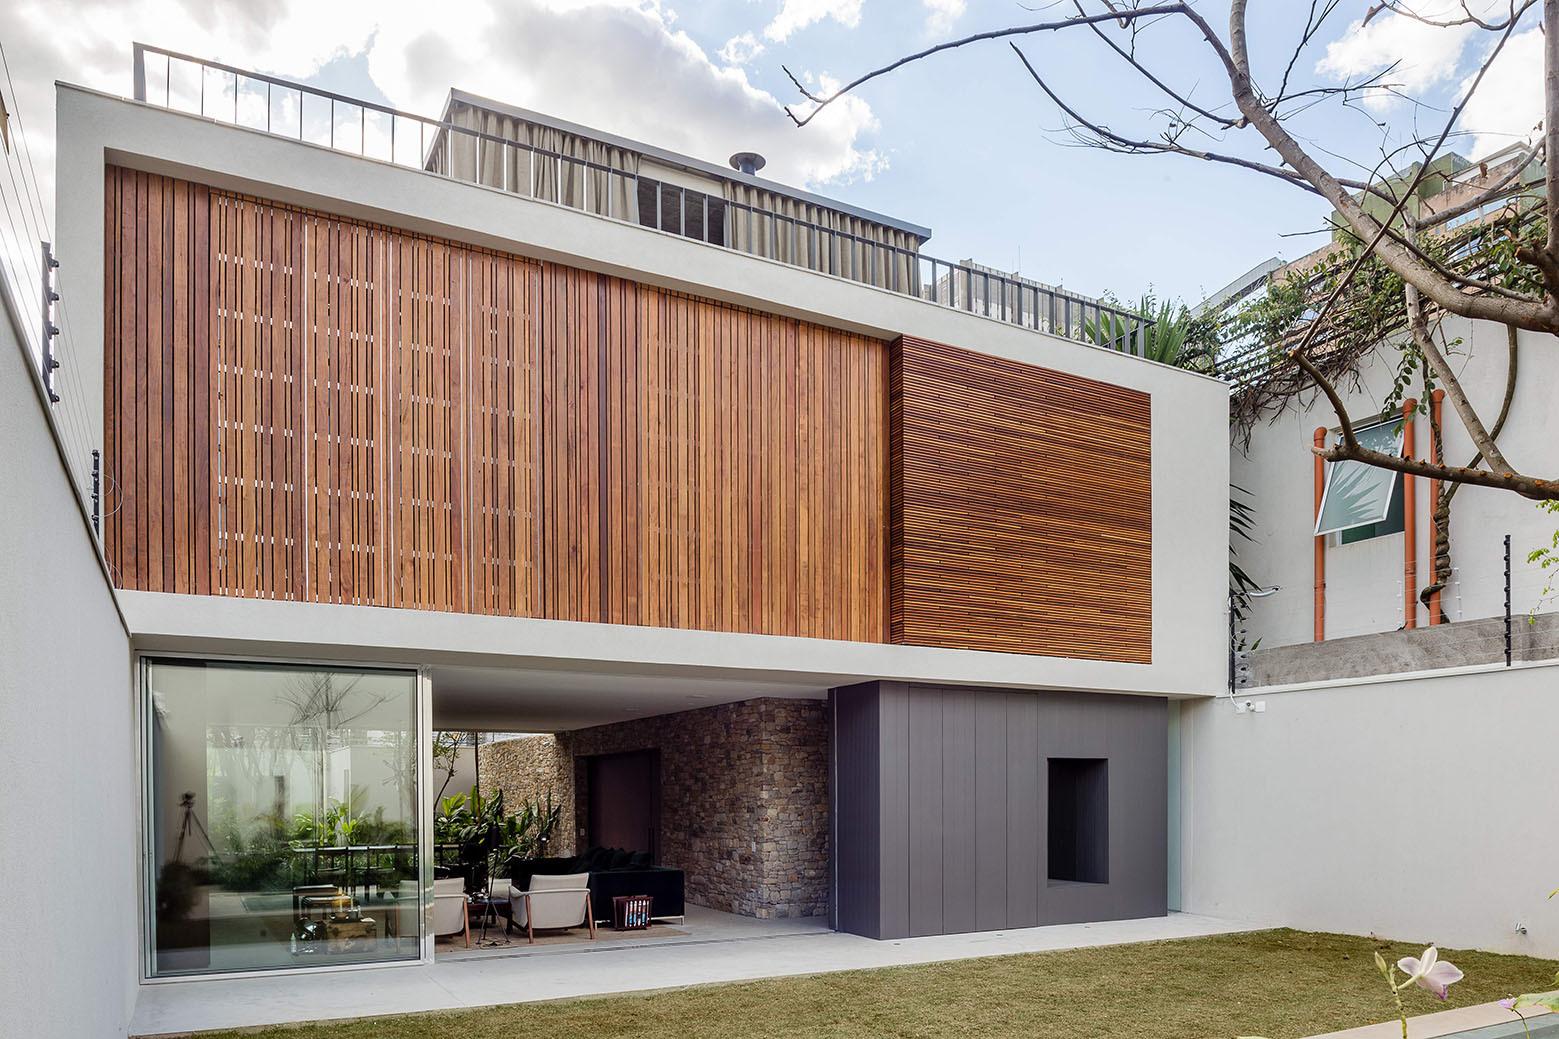 casa lara felipe hess archdaily brasil. Black Bedroom Furniture Sets. Home Design Ideas